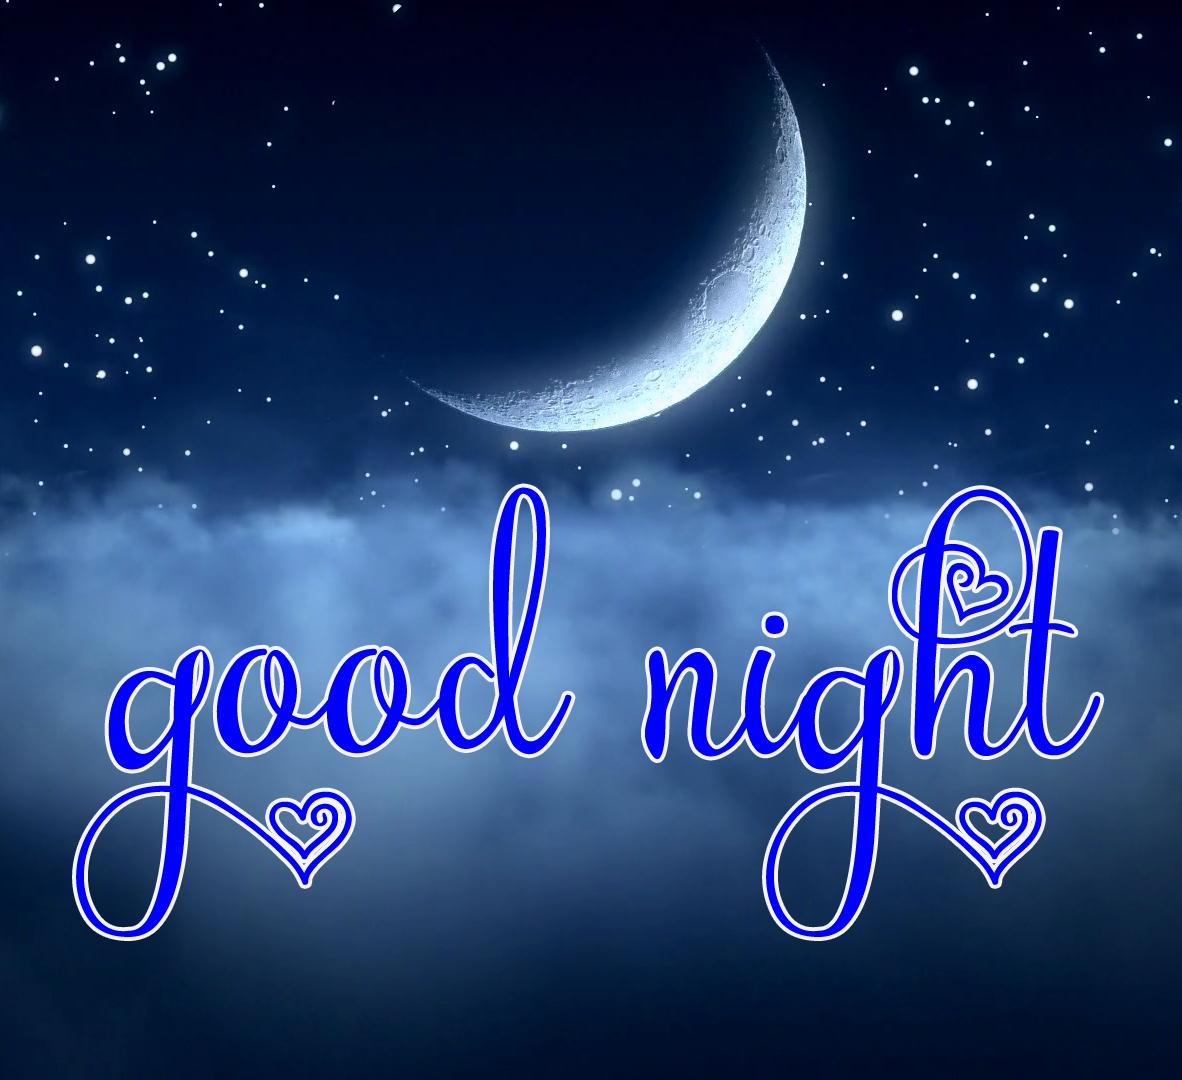 Free good night Images 43